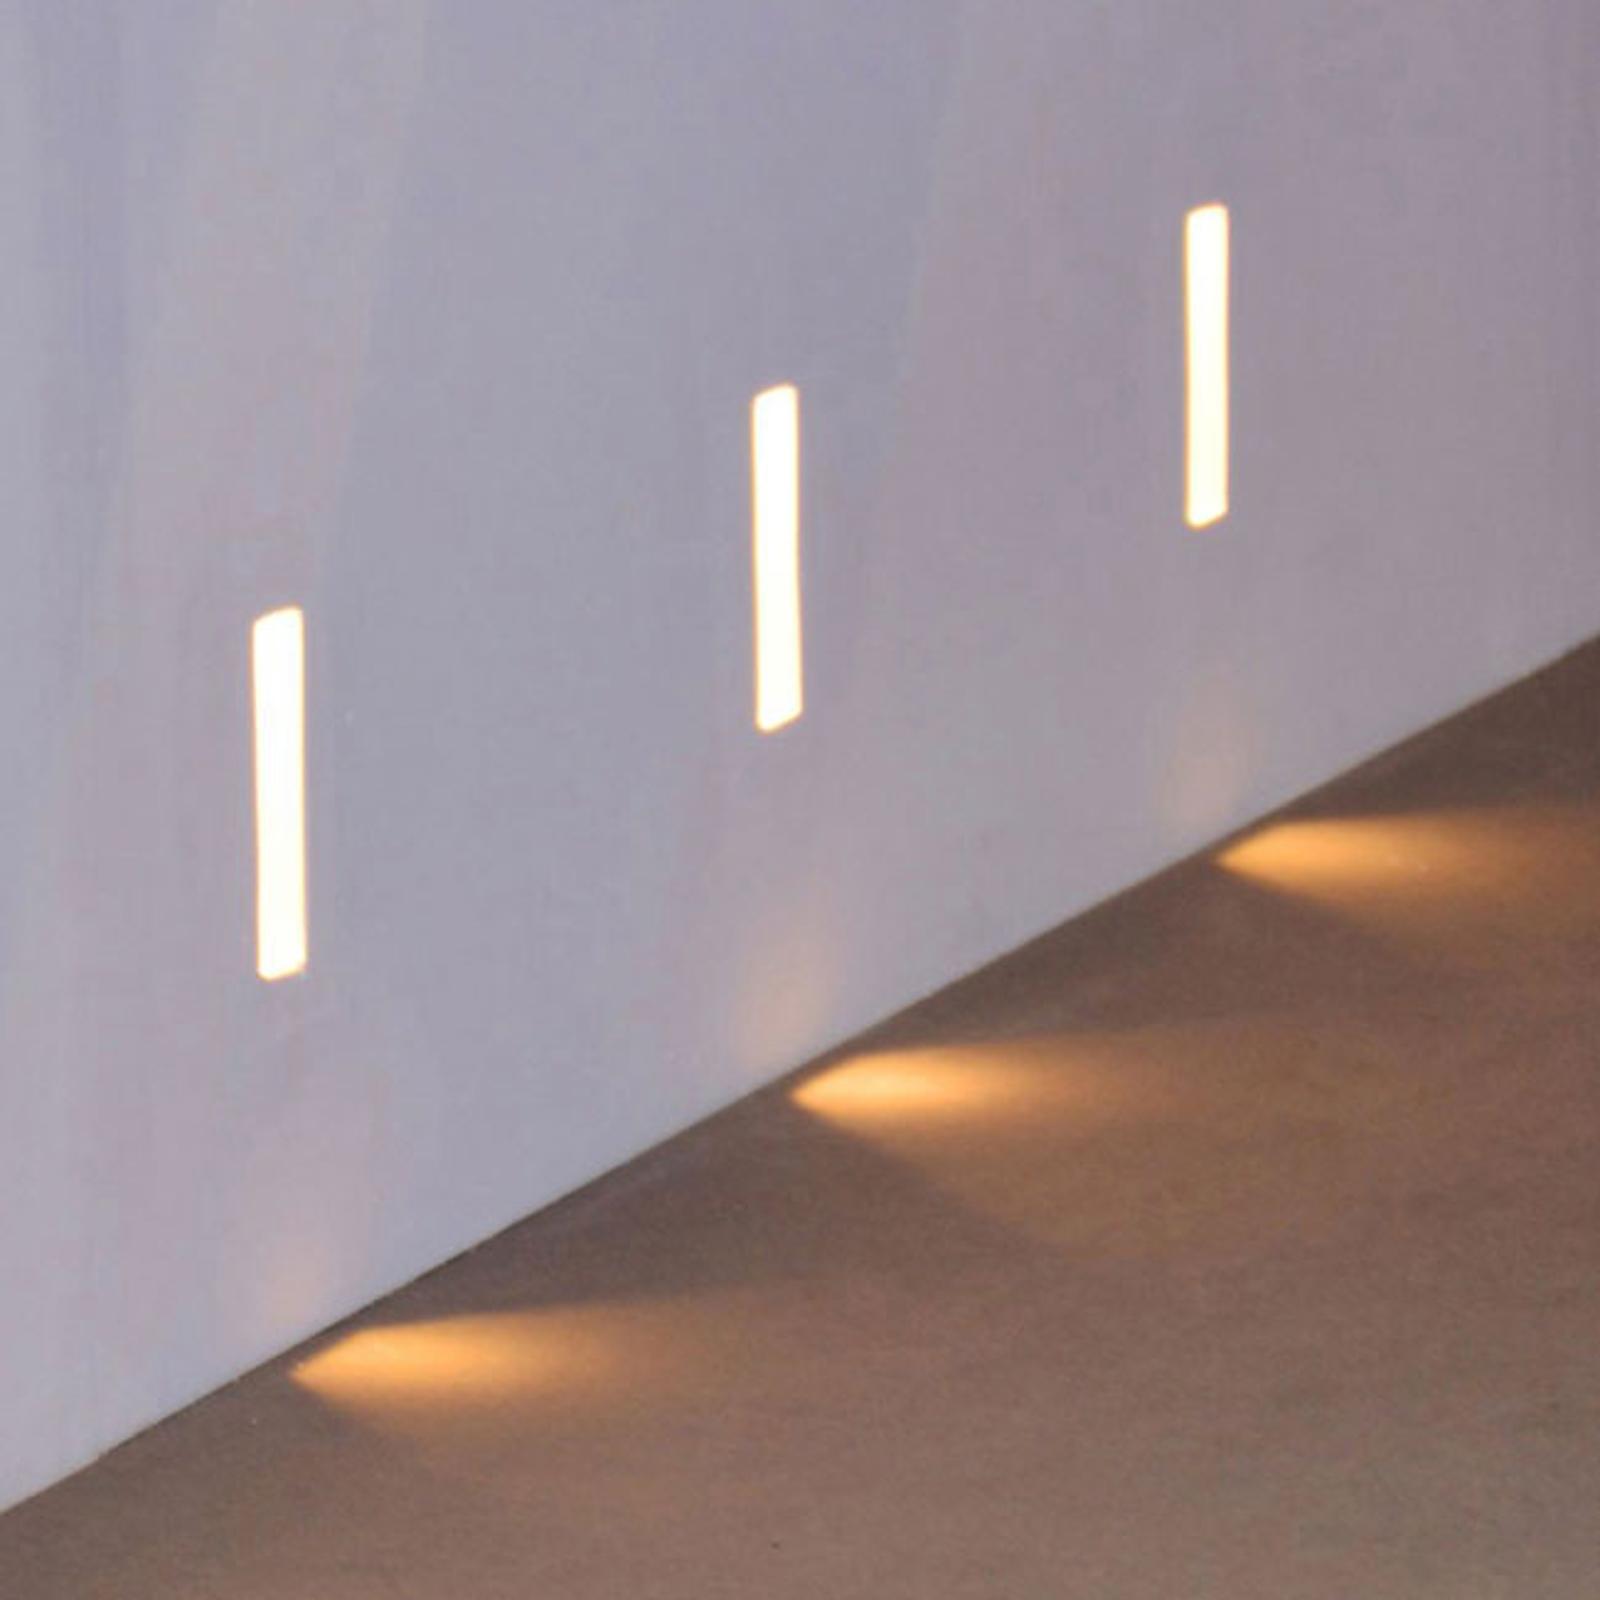 LED-Wandeinbauleuchte Zementos aus Gips